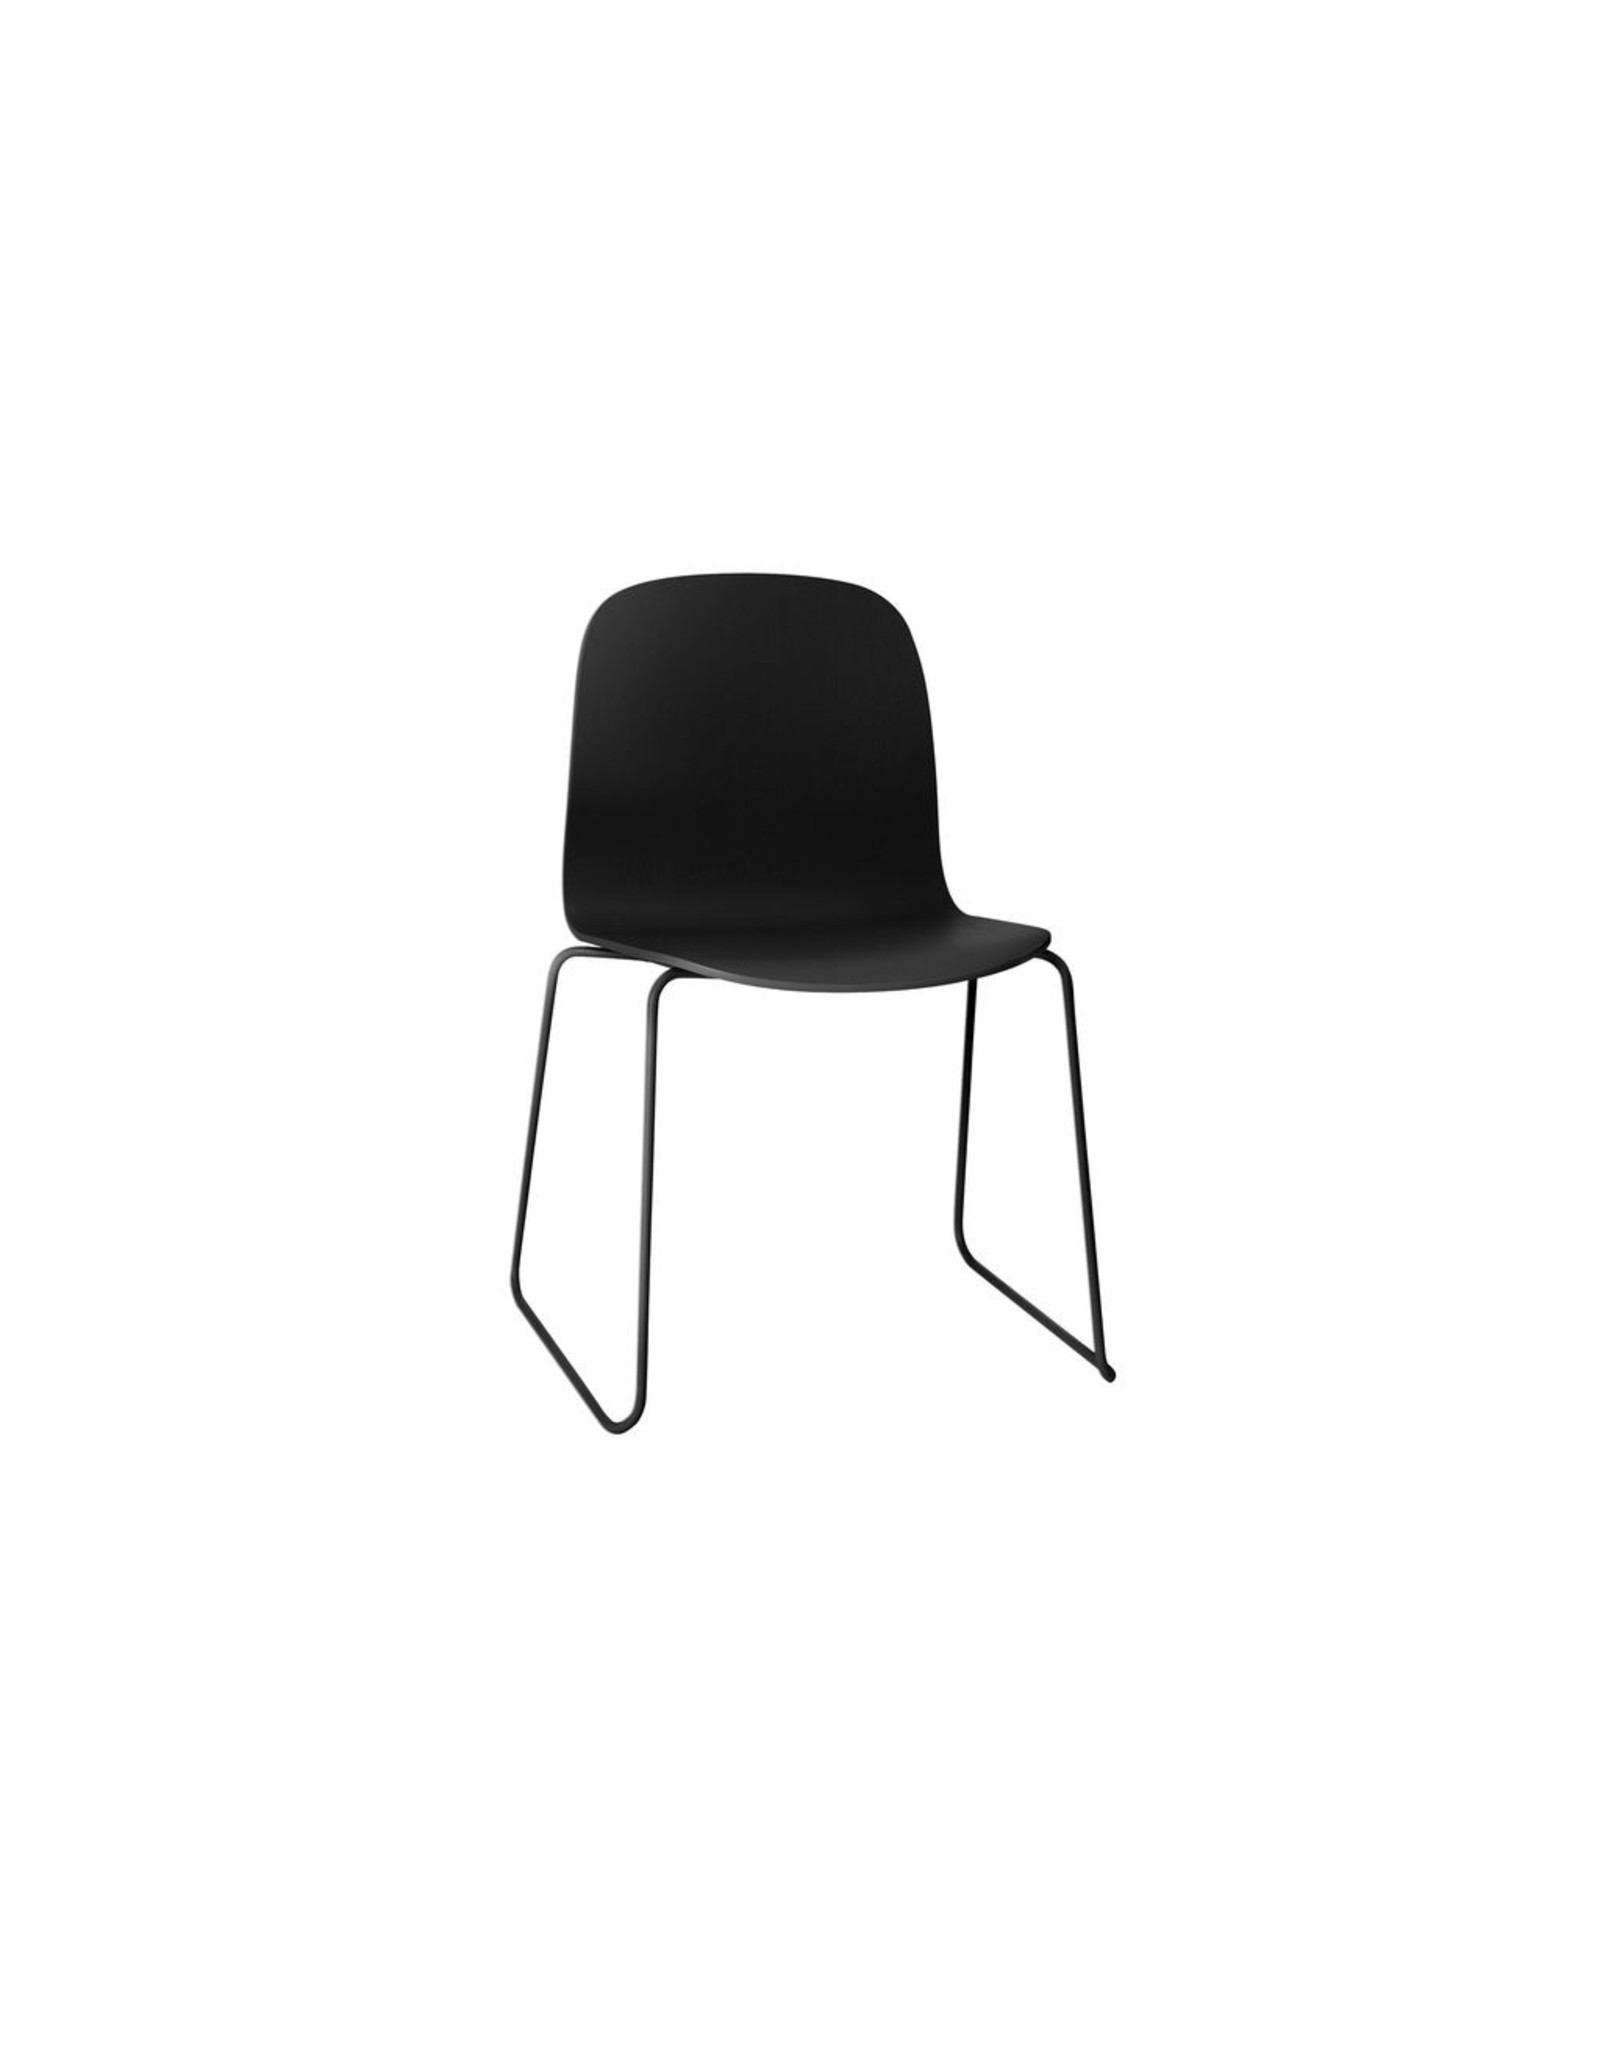 Muuto Visu Chair -Sled Base/ Wood Shell Black